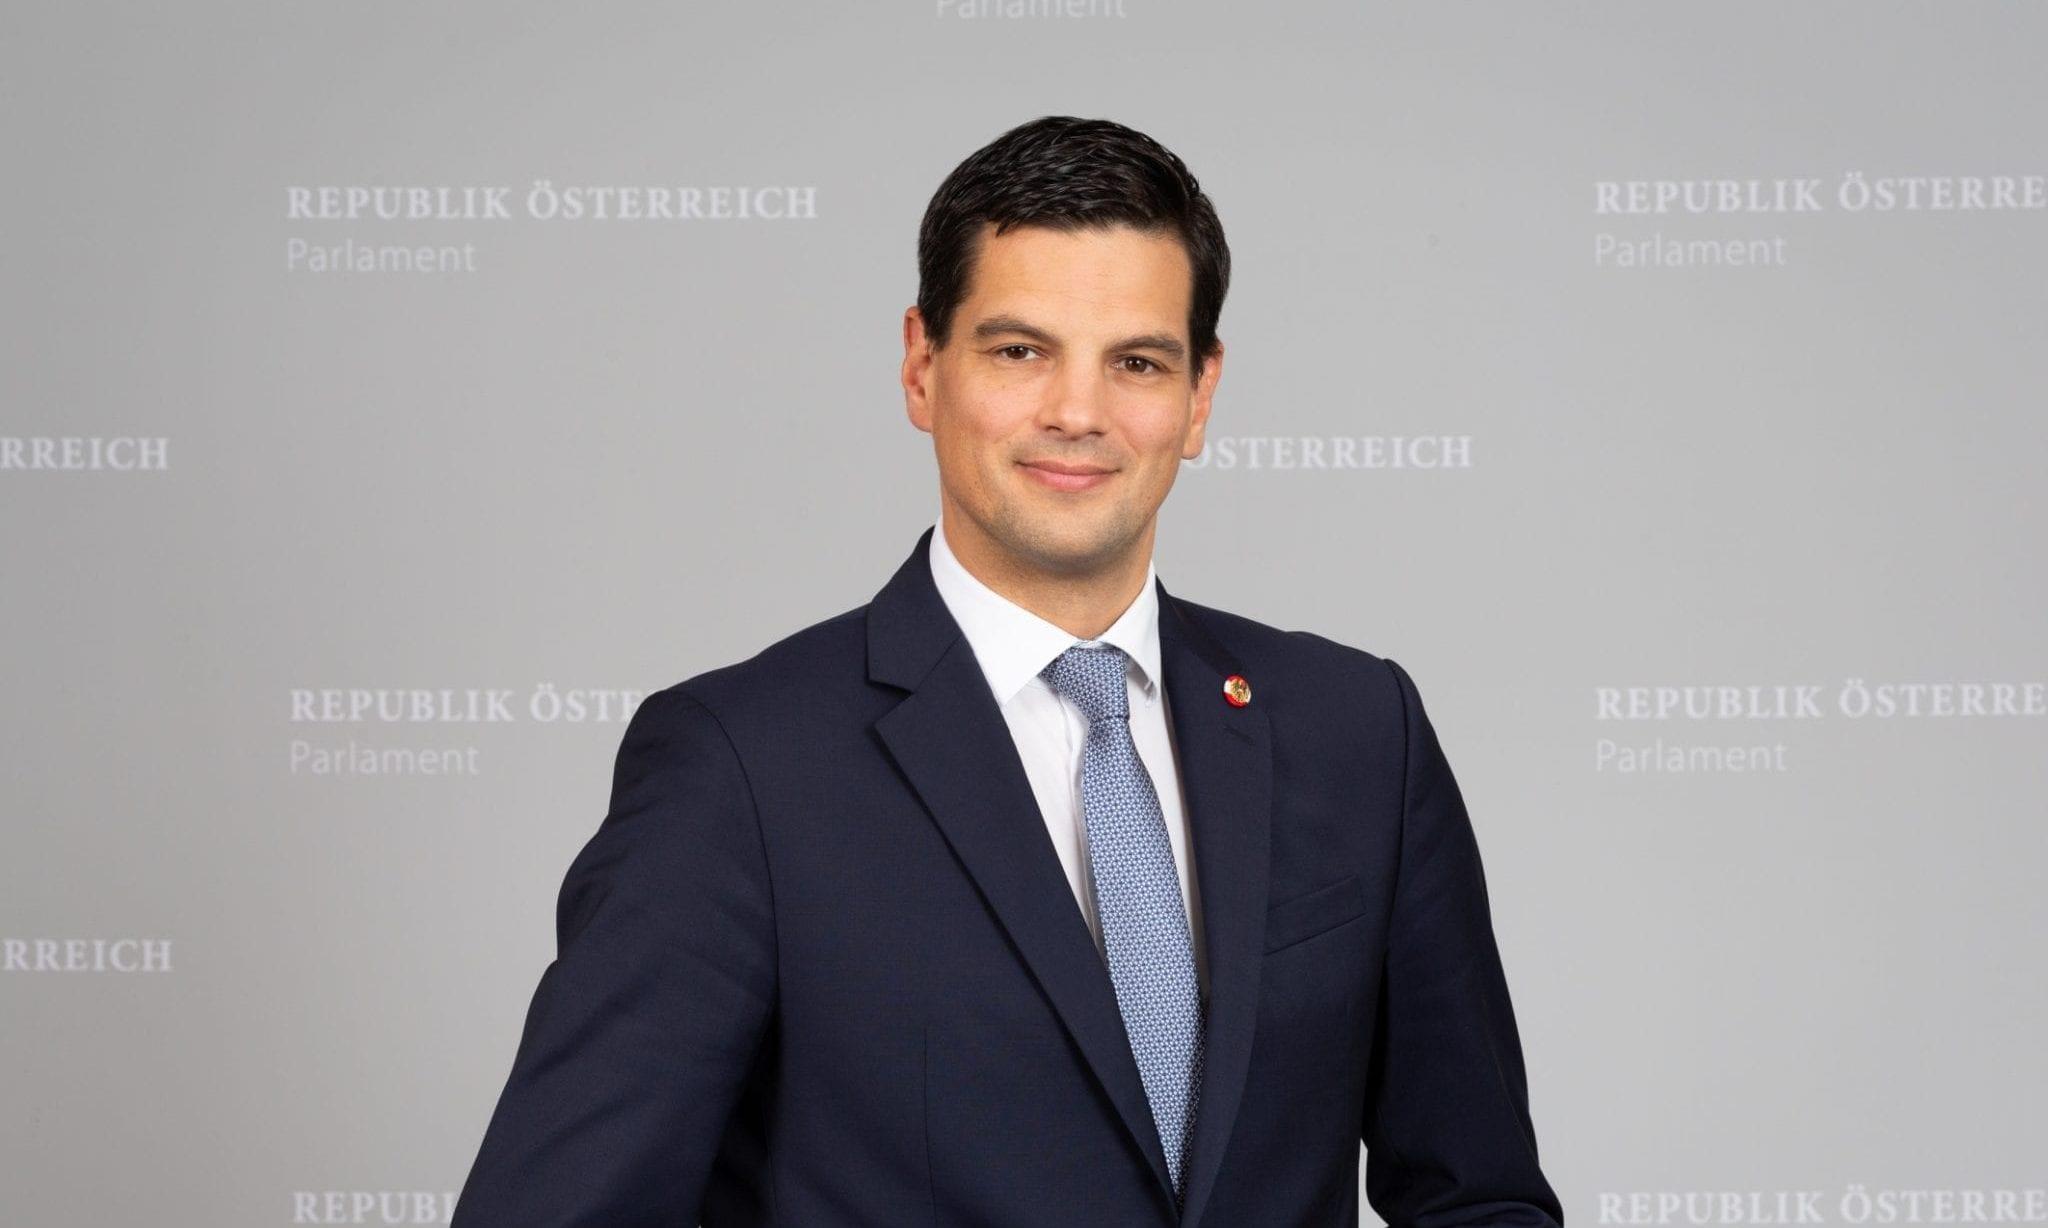 Hannes Amesbauer